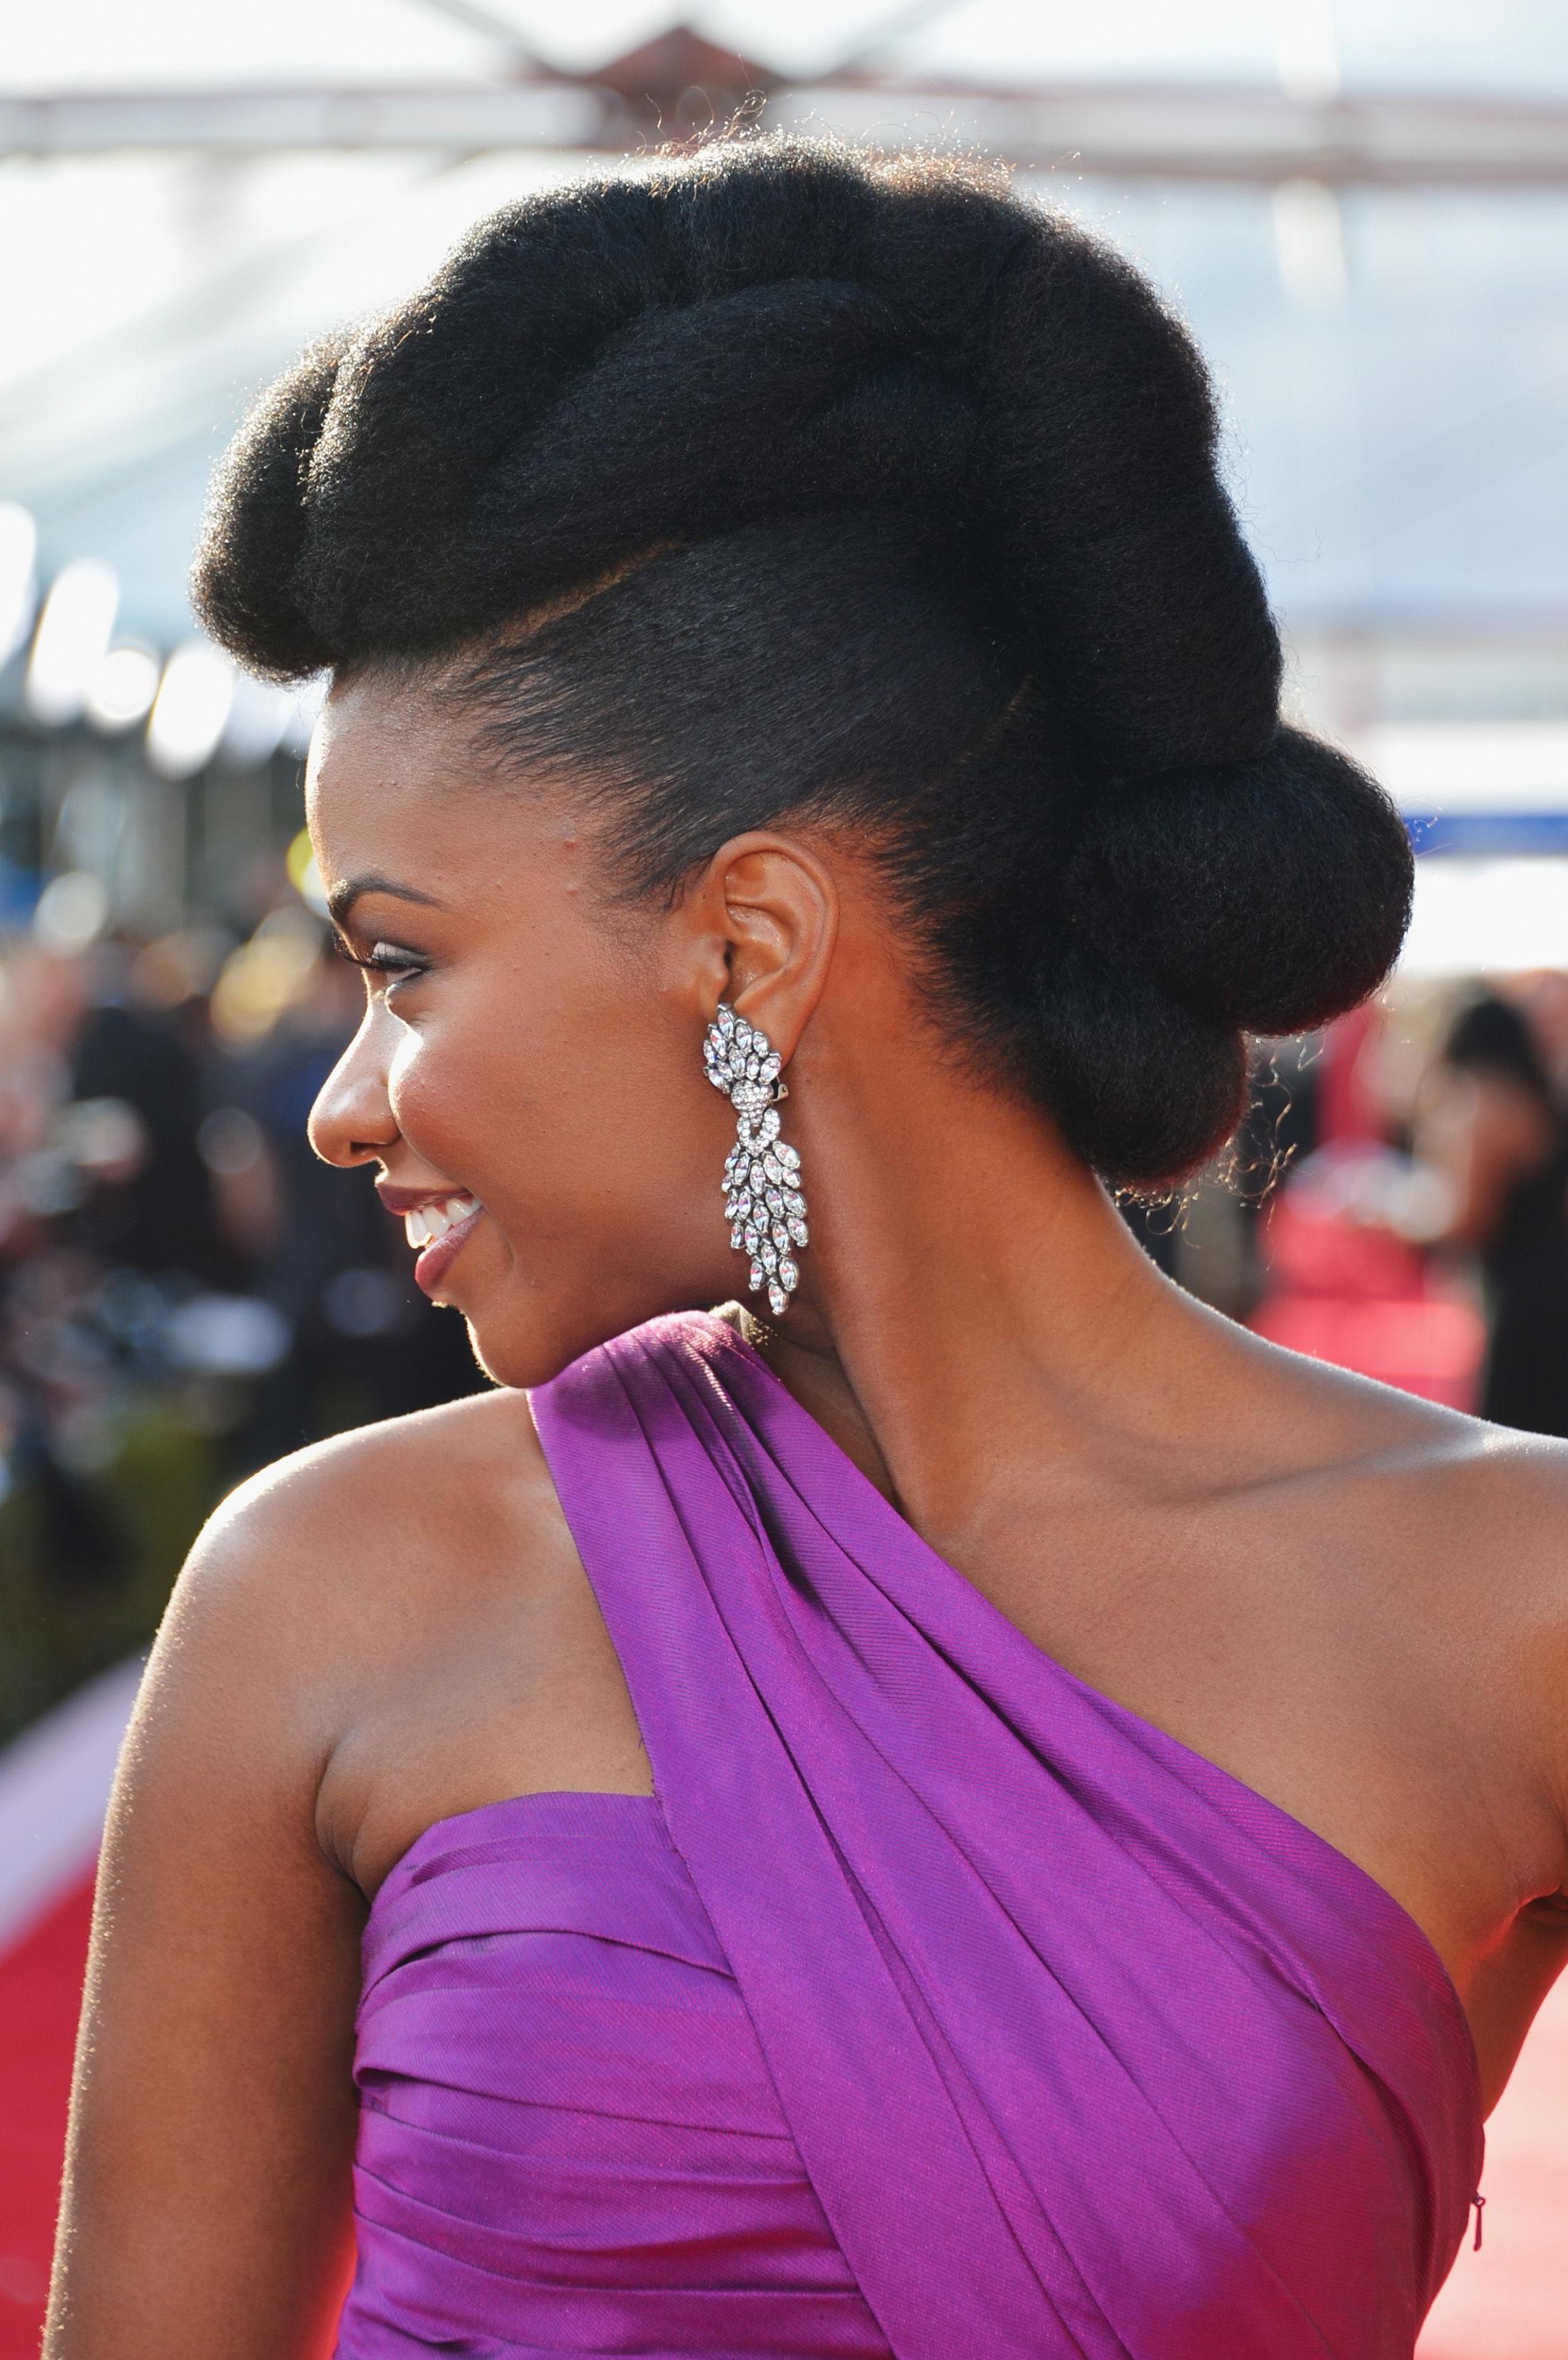 Preferred Medium Haircuts For Black Women With Natural Hair In 30 Easy Natural Hairstyles For Black Women – Short, Medium & Long (View 18 of 20)